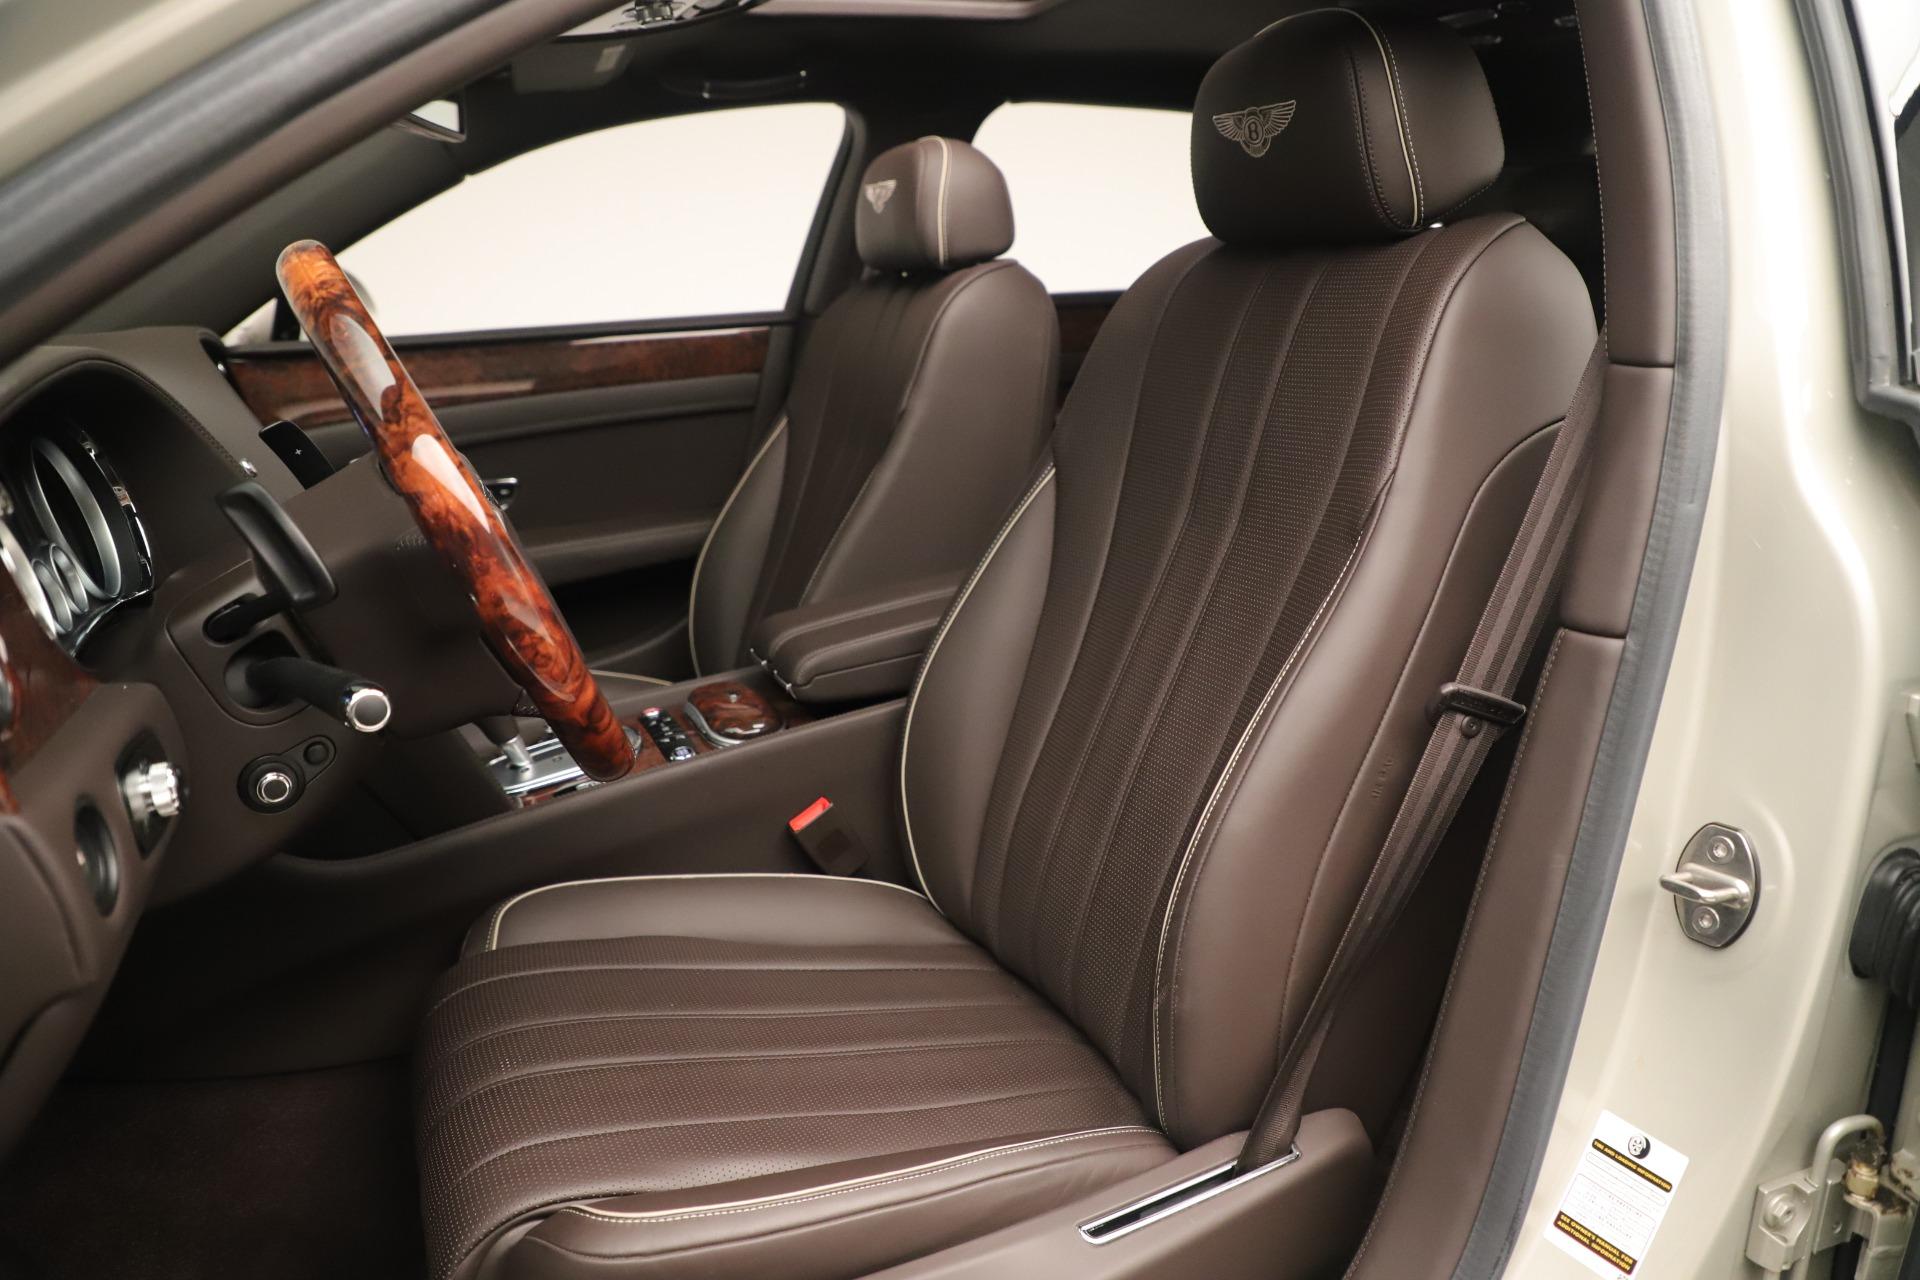 Used 2015 Bentley Flying Spur V8 For Sale In Westport, CT 3444_p18